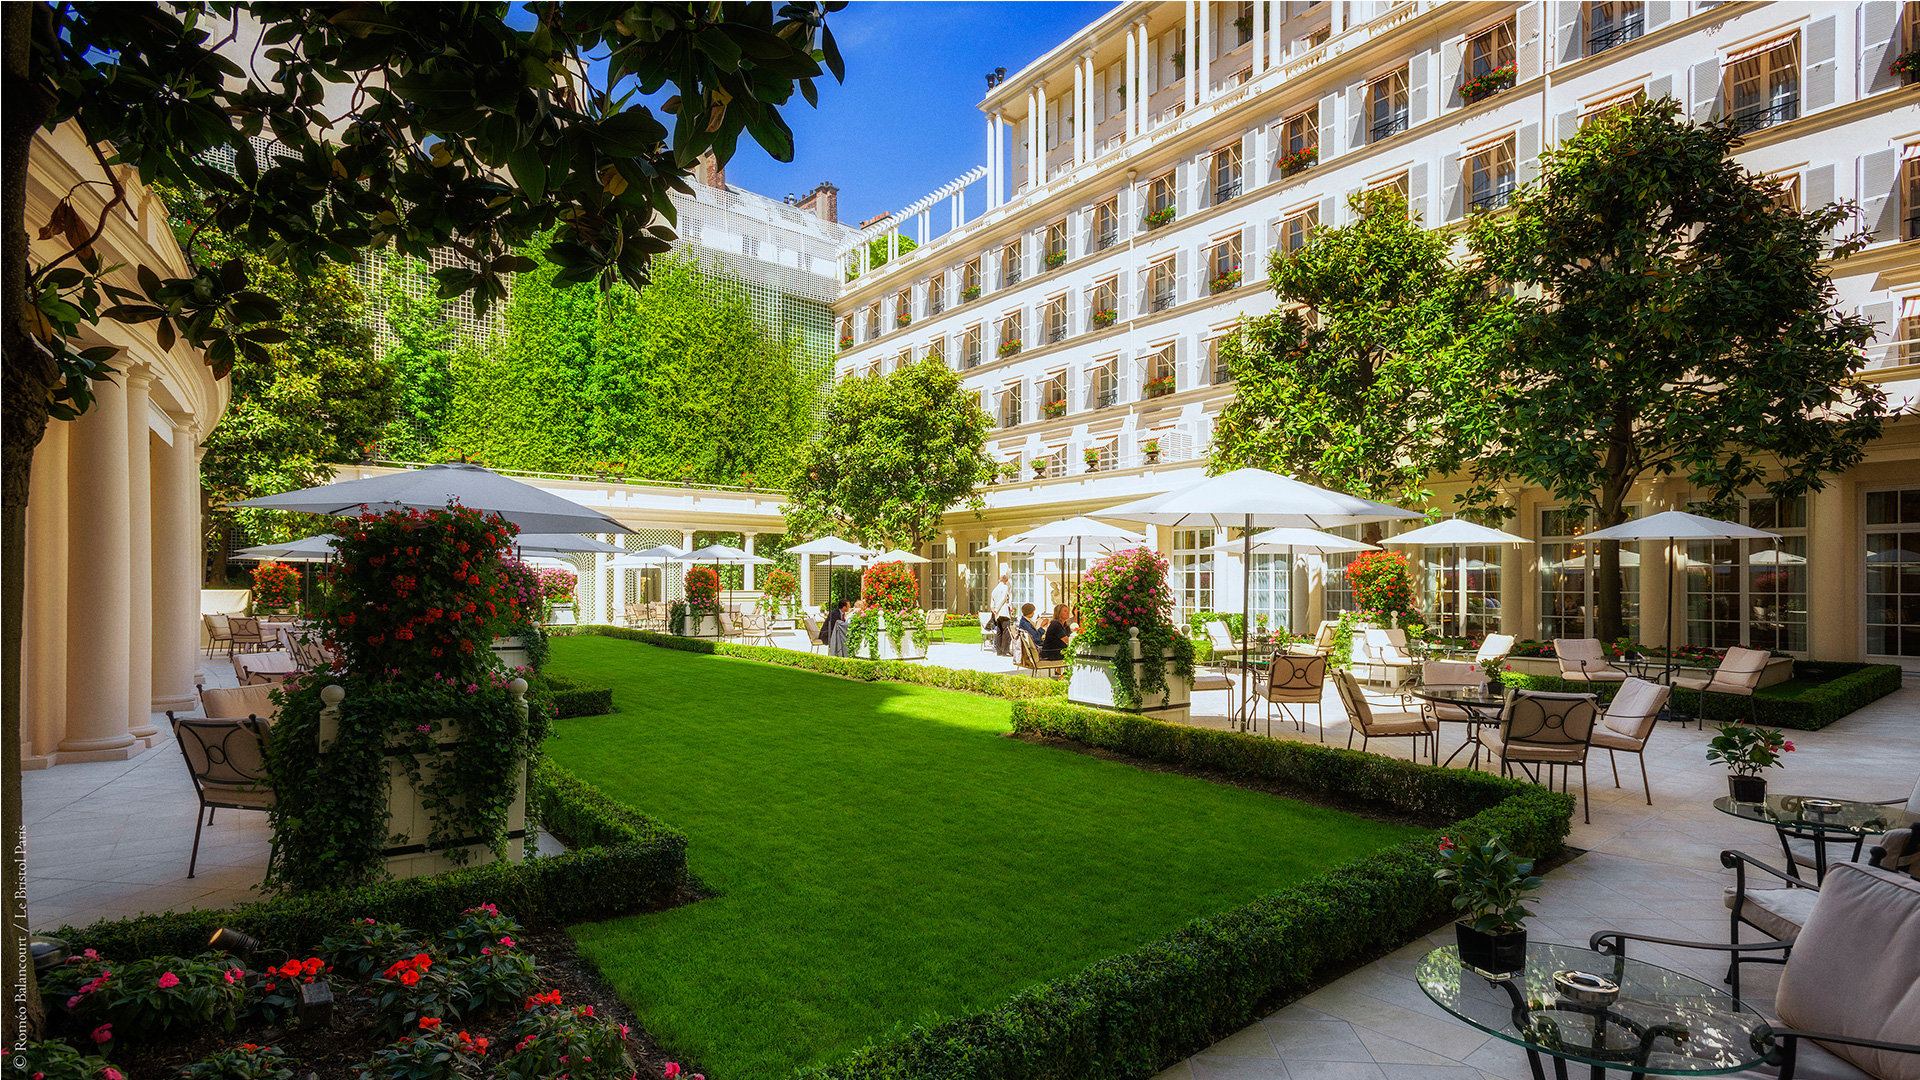 Bristol Hotel Paris Spa